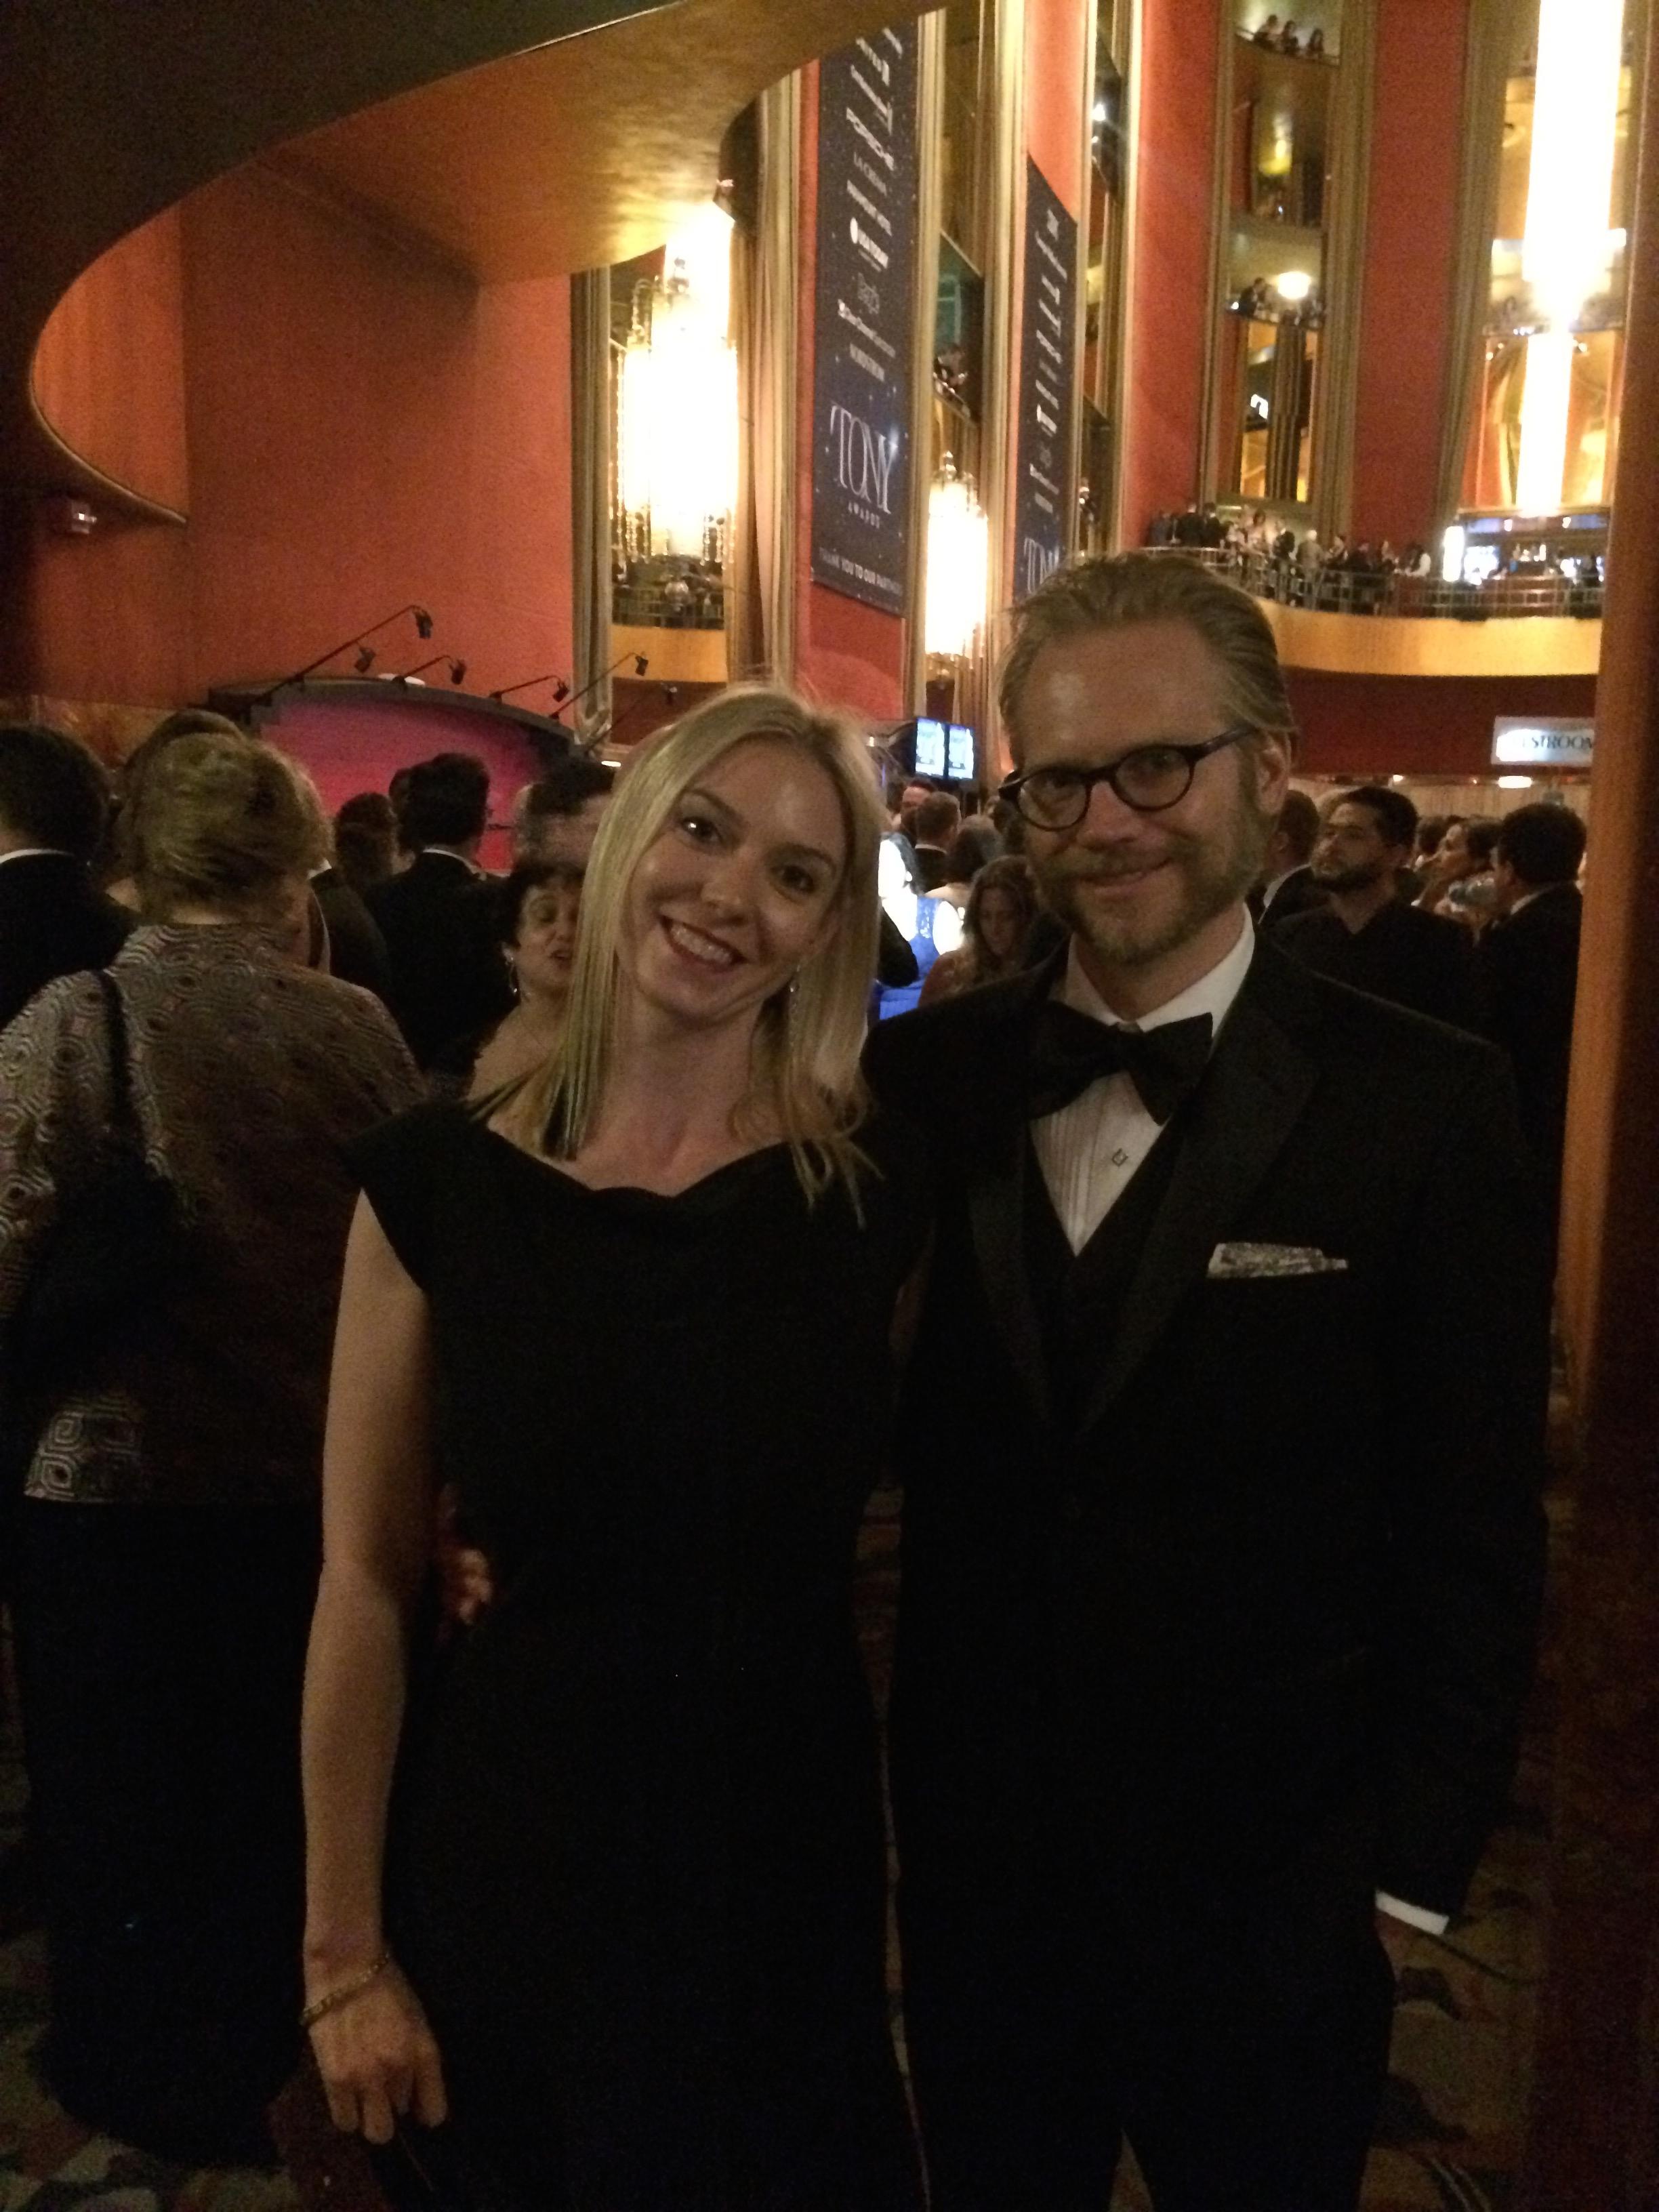 Nick Kargel and wife Emily Zeck at Tony Awards 2015